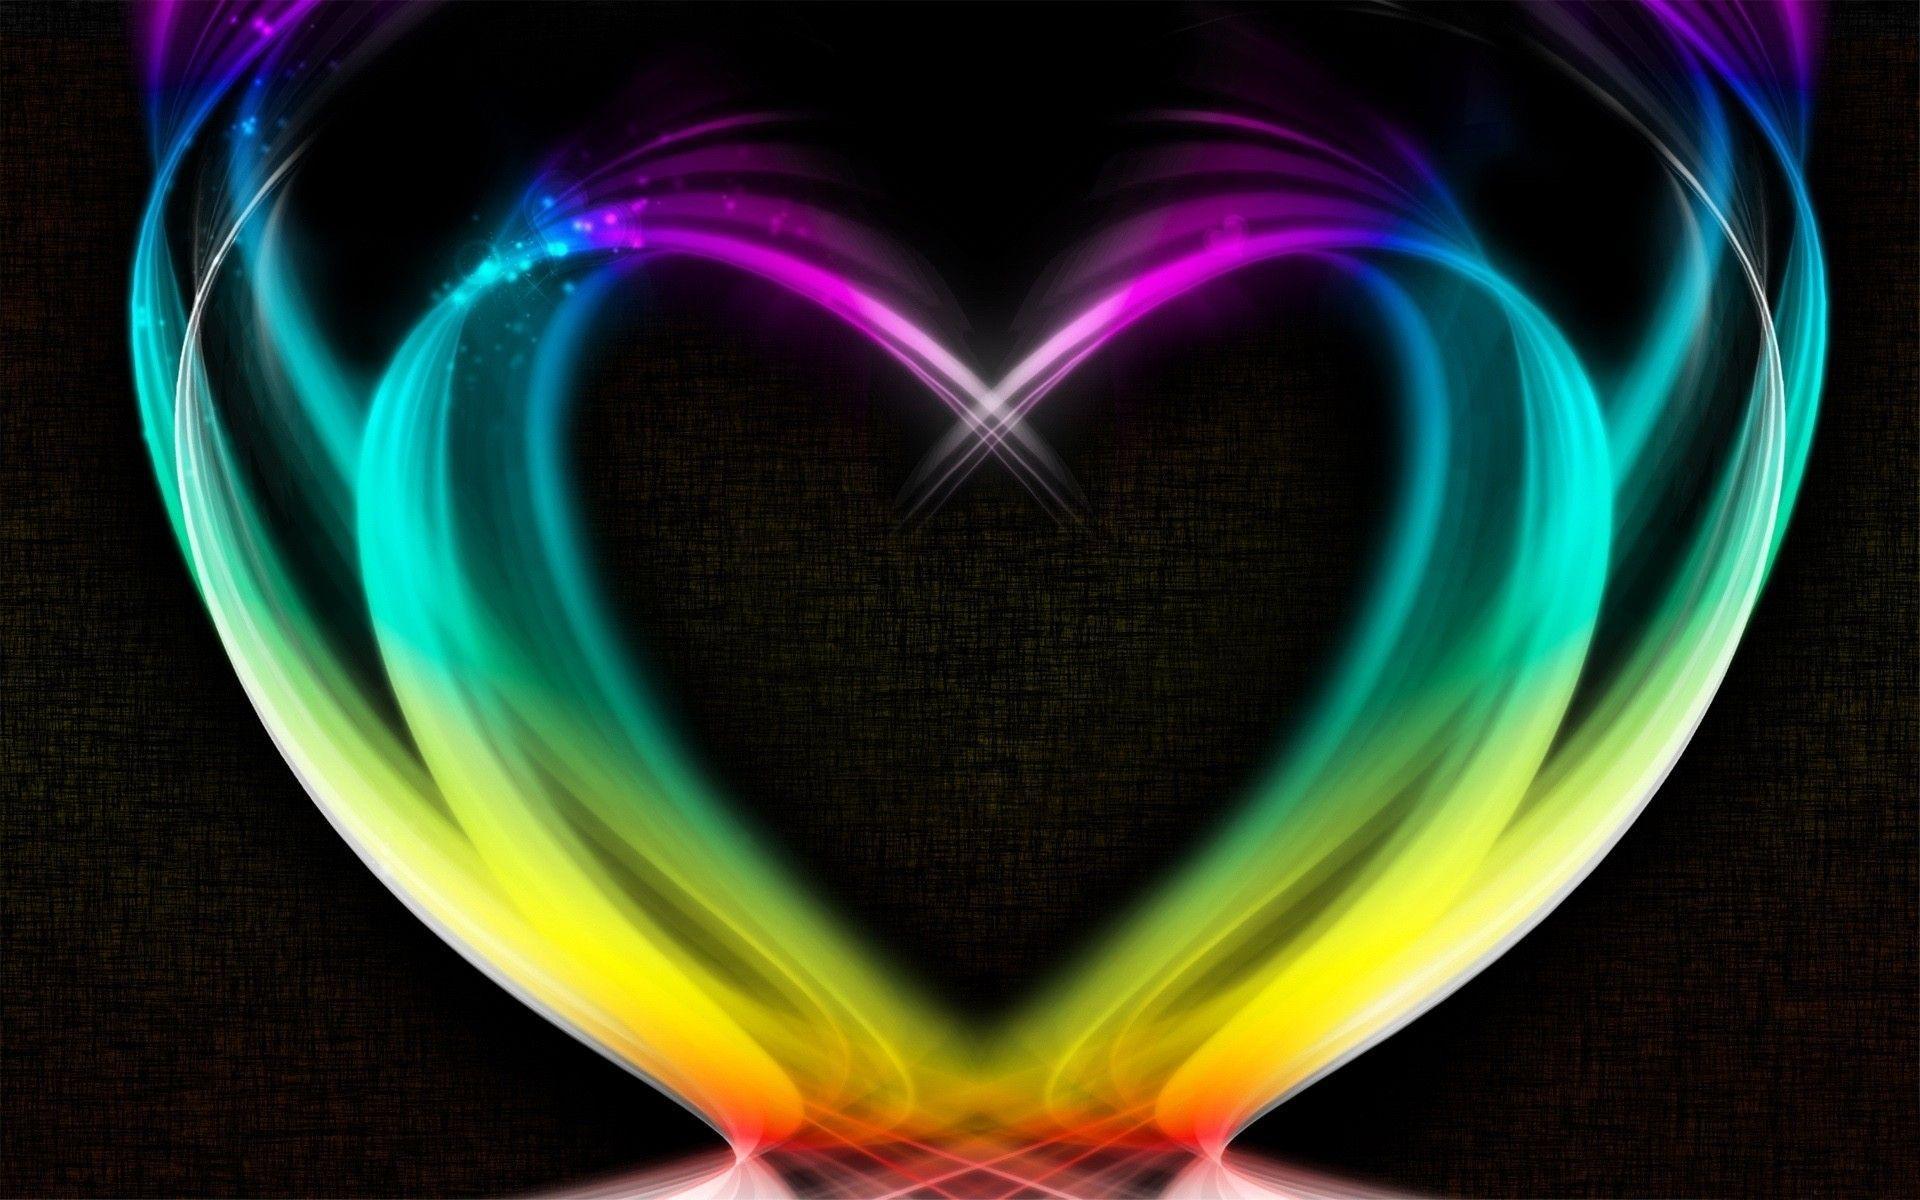 Rainbow Heart Backgrounds Wallpaper Cave